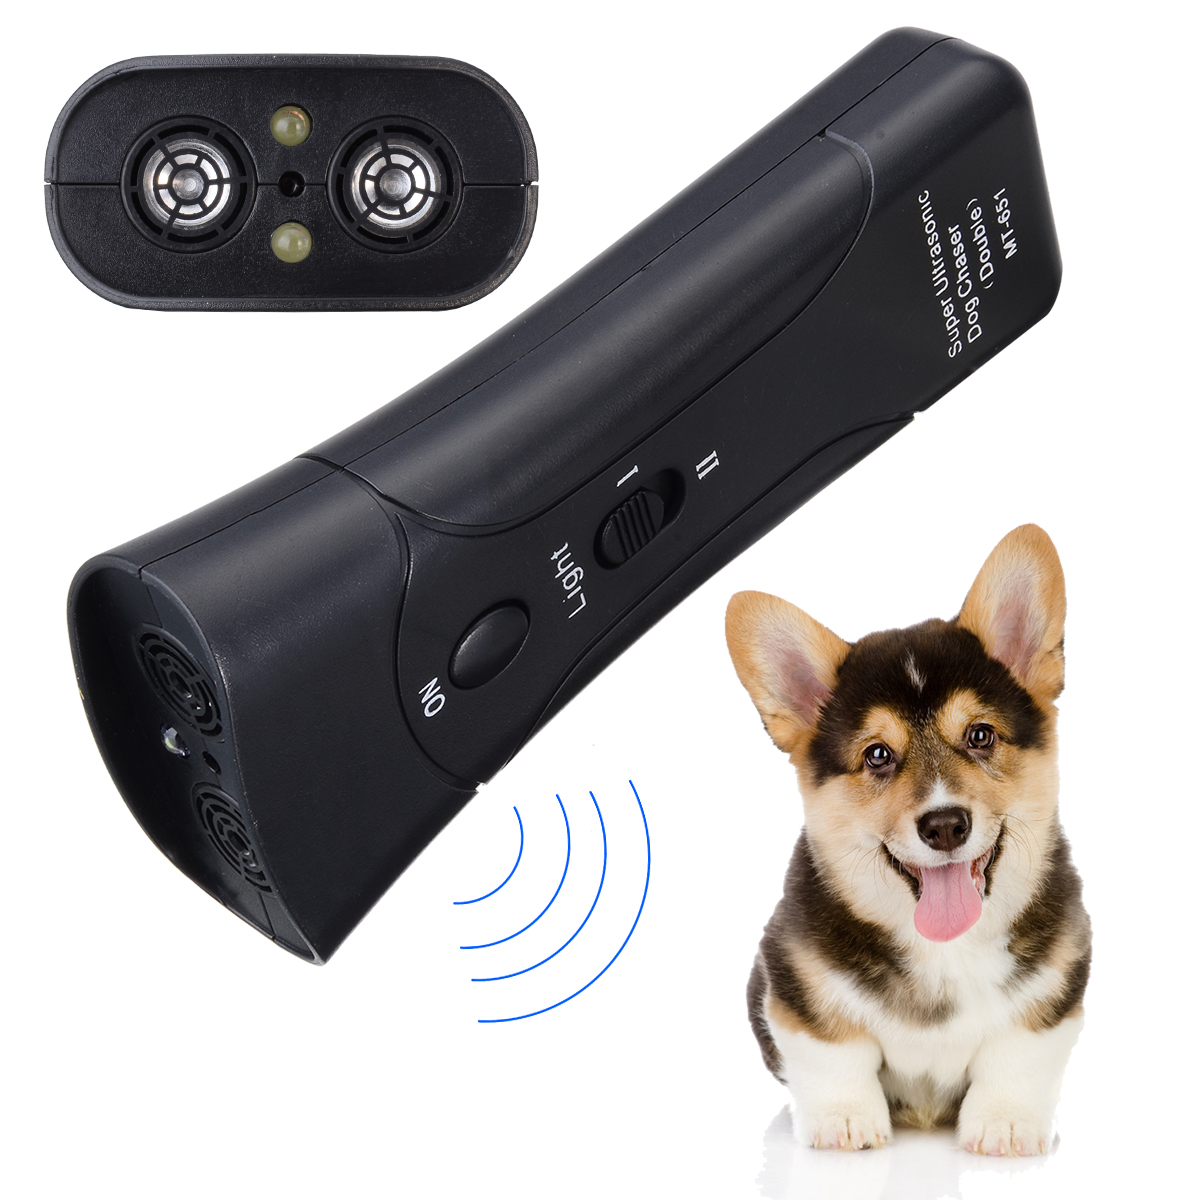 Ultrasonic font b Pet b font Dog Anti Barking Trainer Multifunctional Gentle Chaser font b Pet